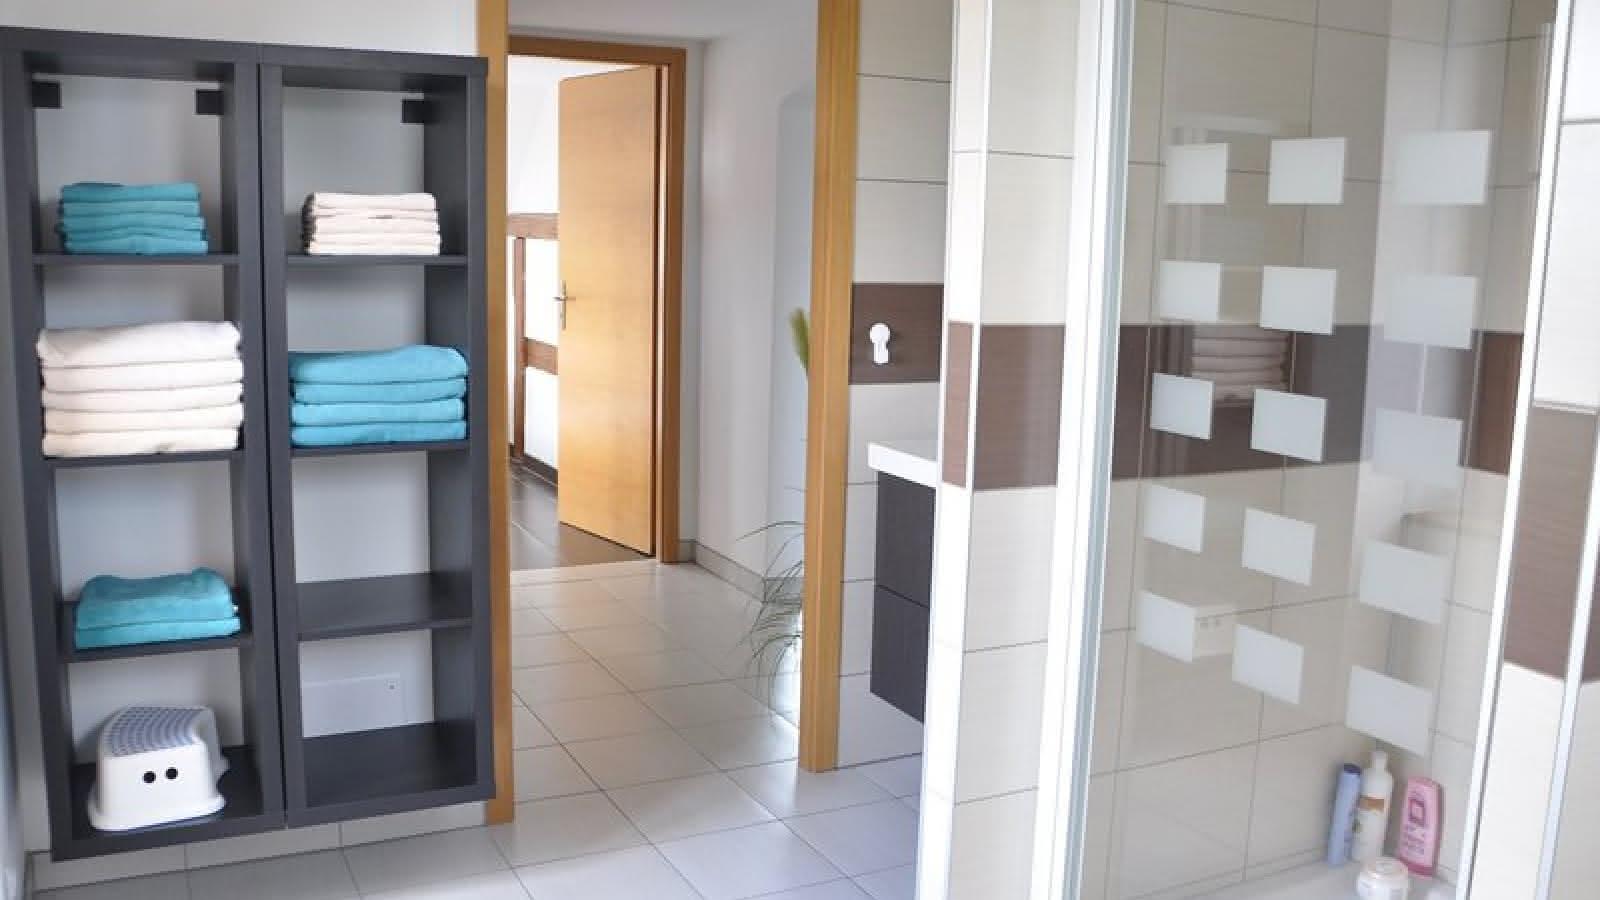 Piscines Es & Spas chez alice - alsace piscine spa jacuzzi - neuve eglise